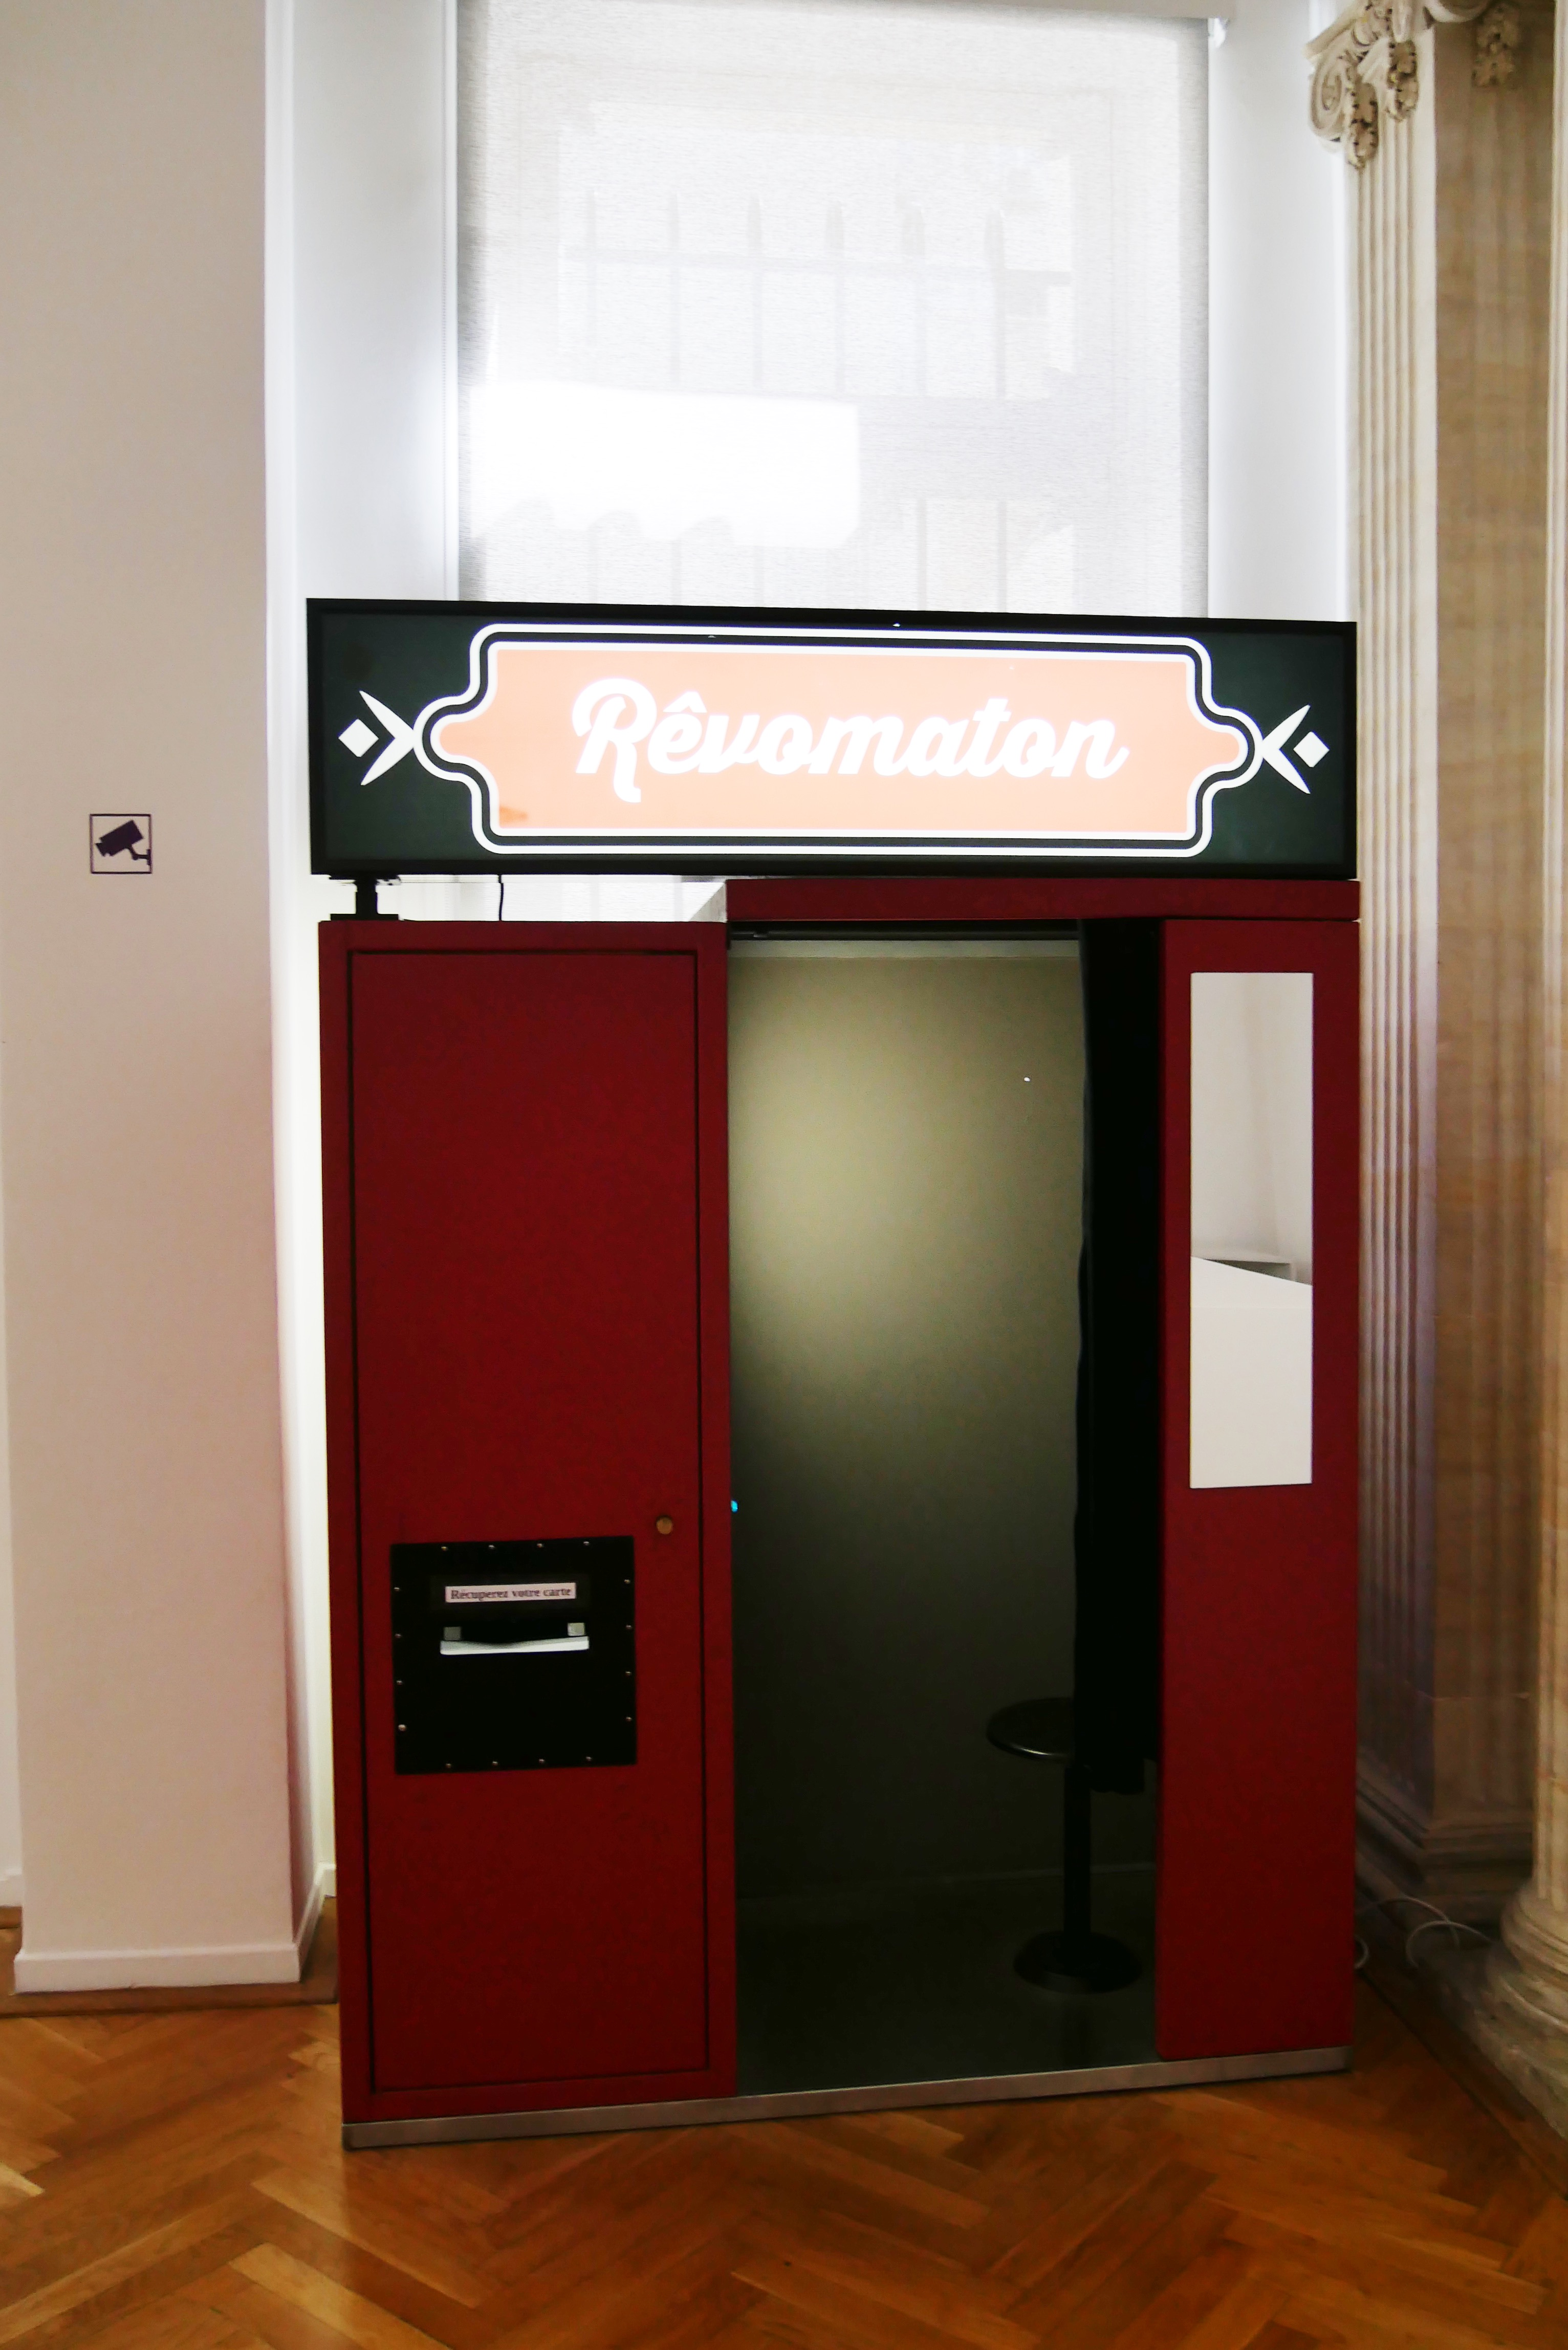 revomaton-cabine-photomaton-original-exposition-le-reve-musee-cantini-marseille-photo-usofparis-blog